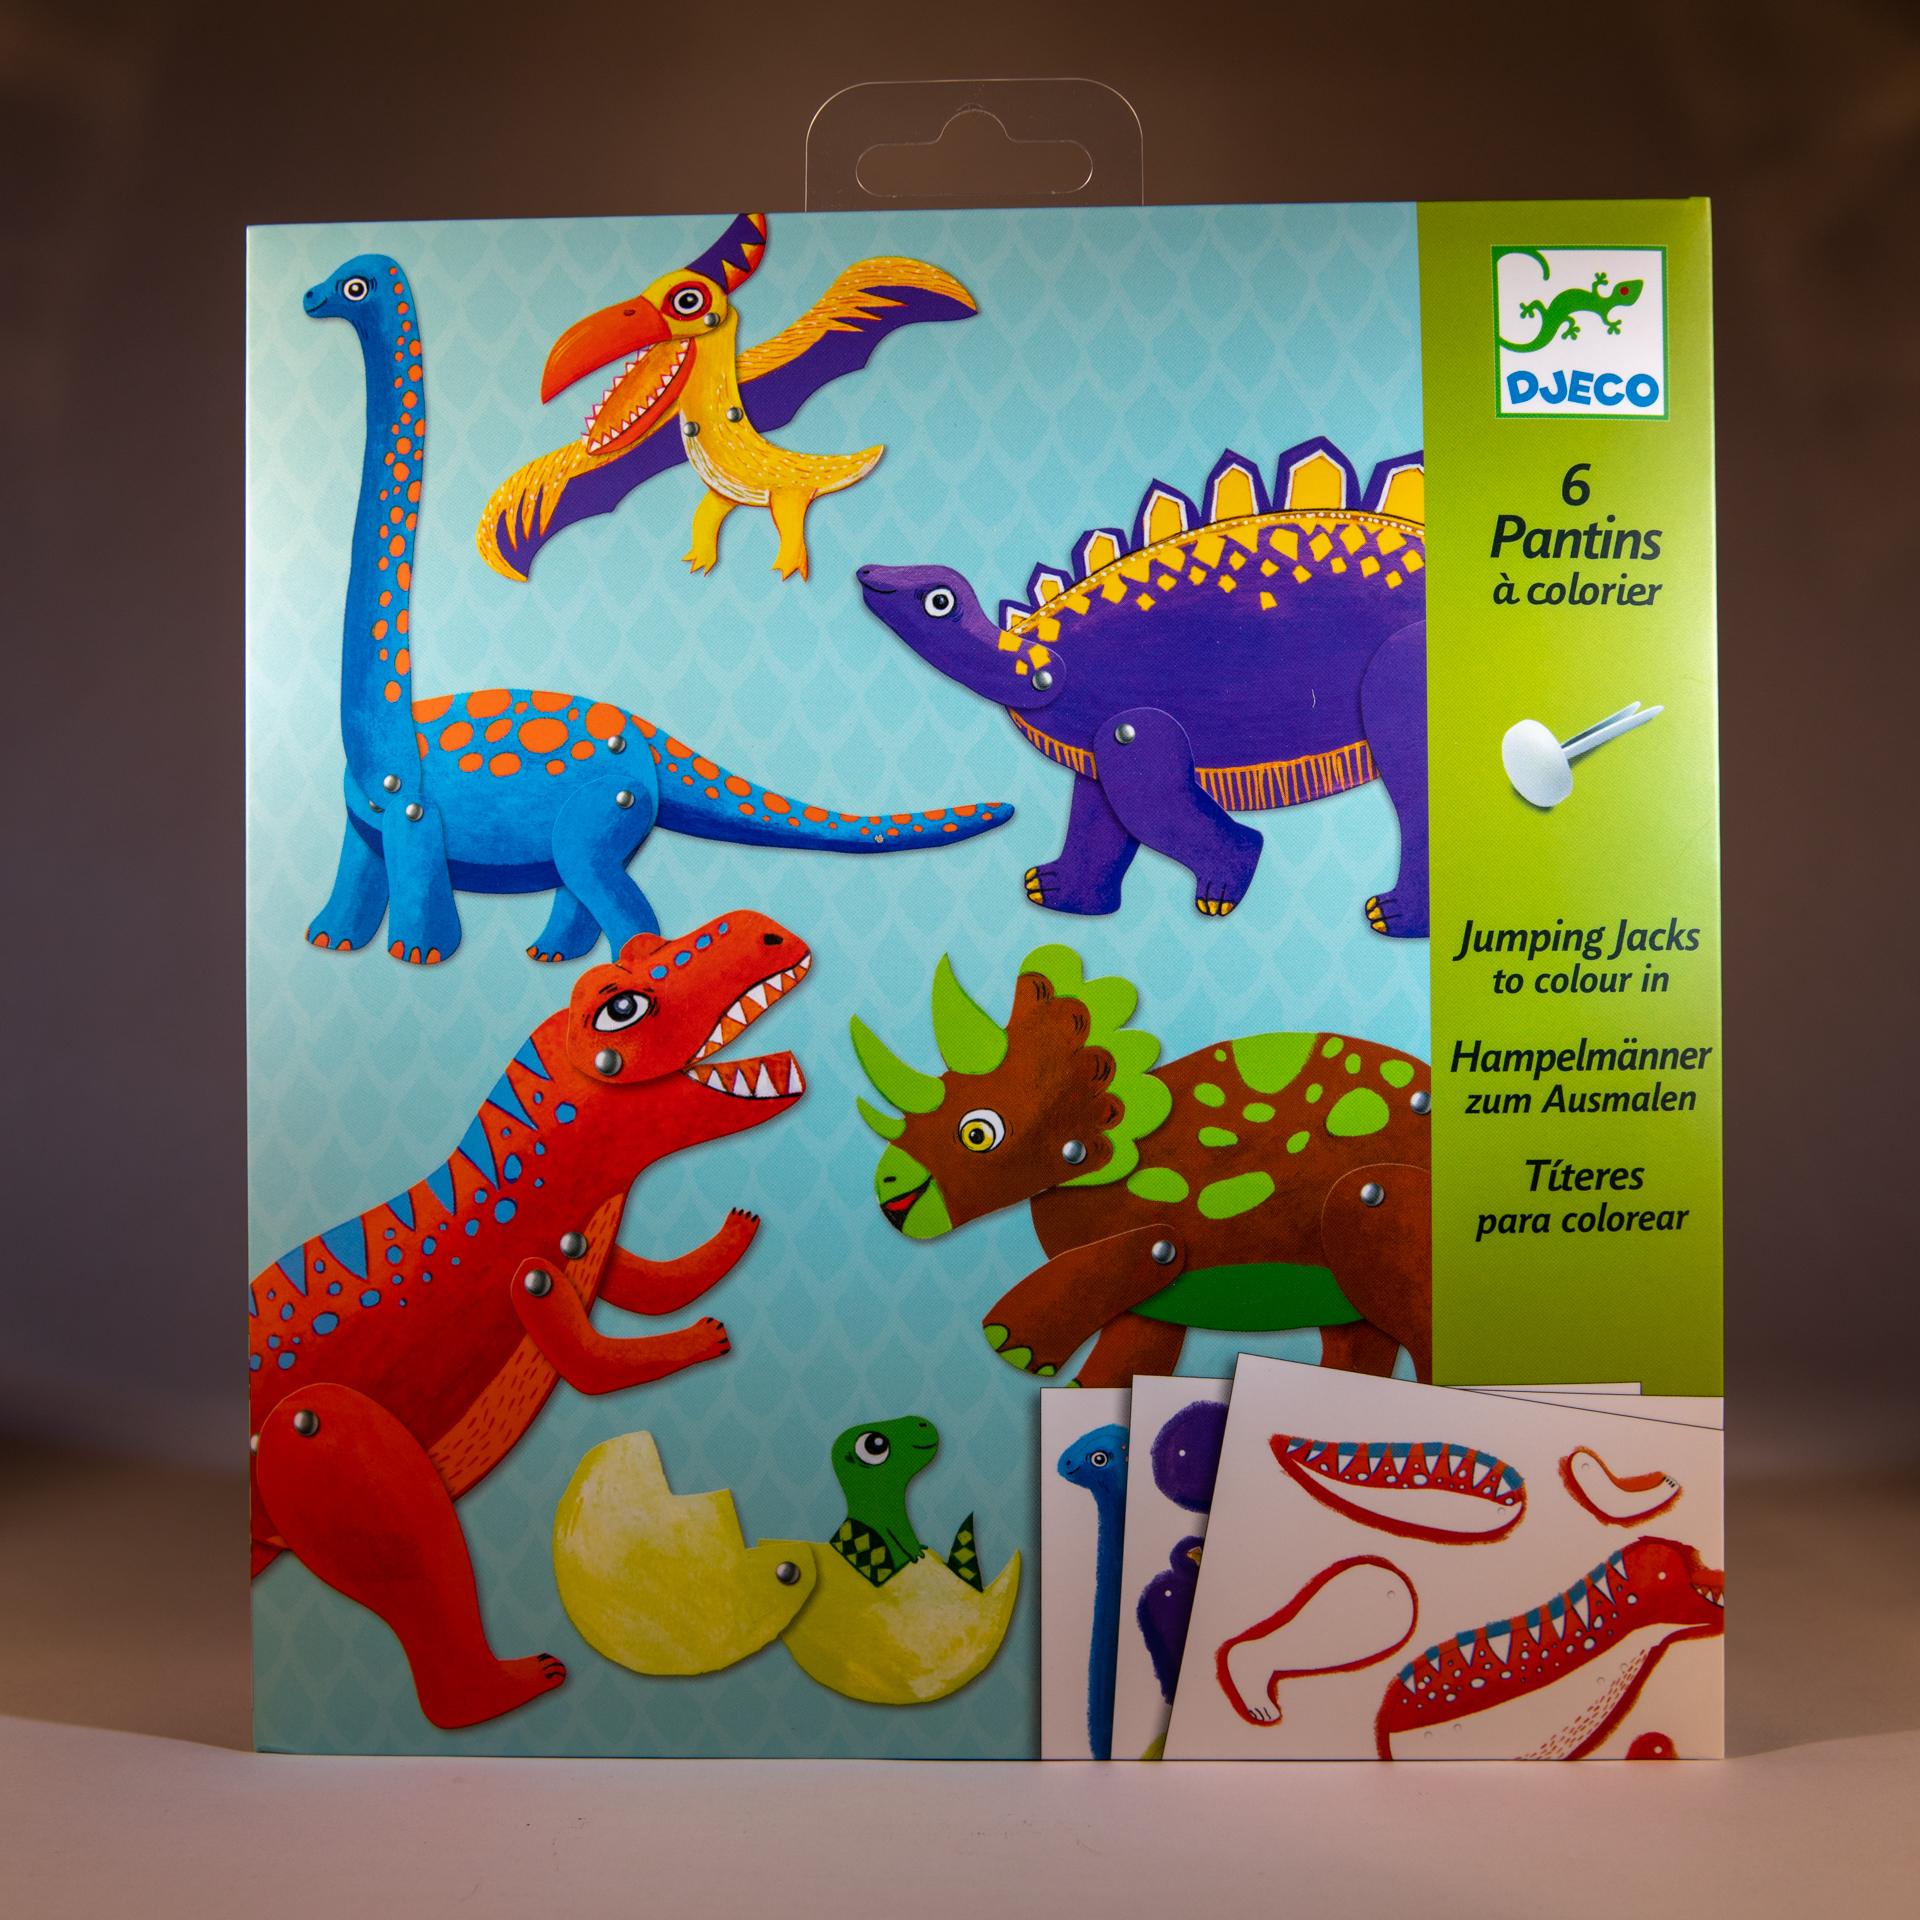 Jumping Jacks Dinosaurs